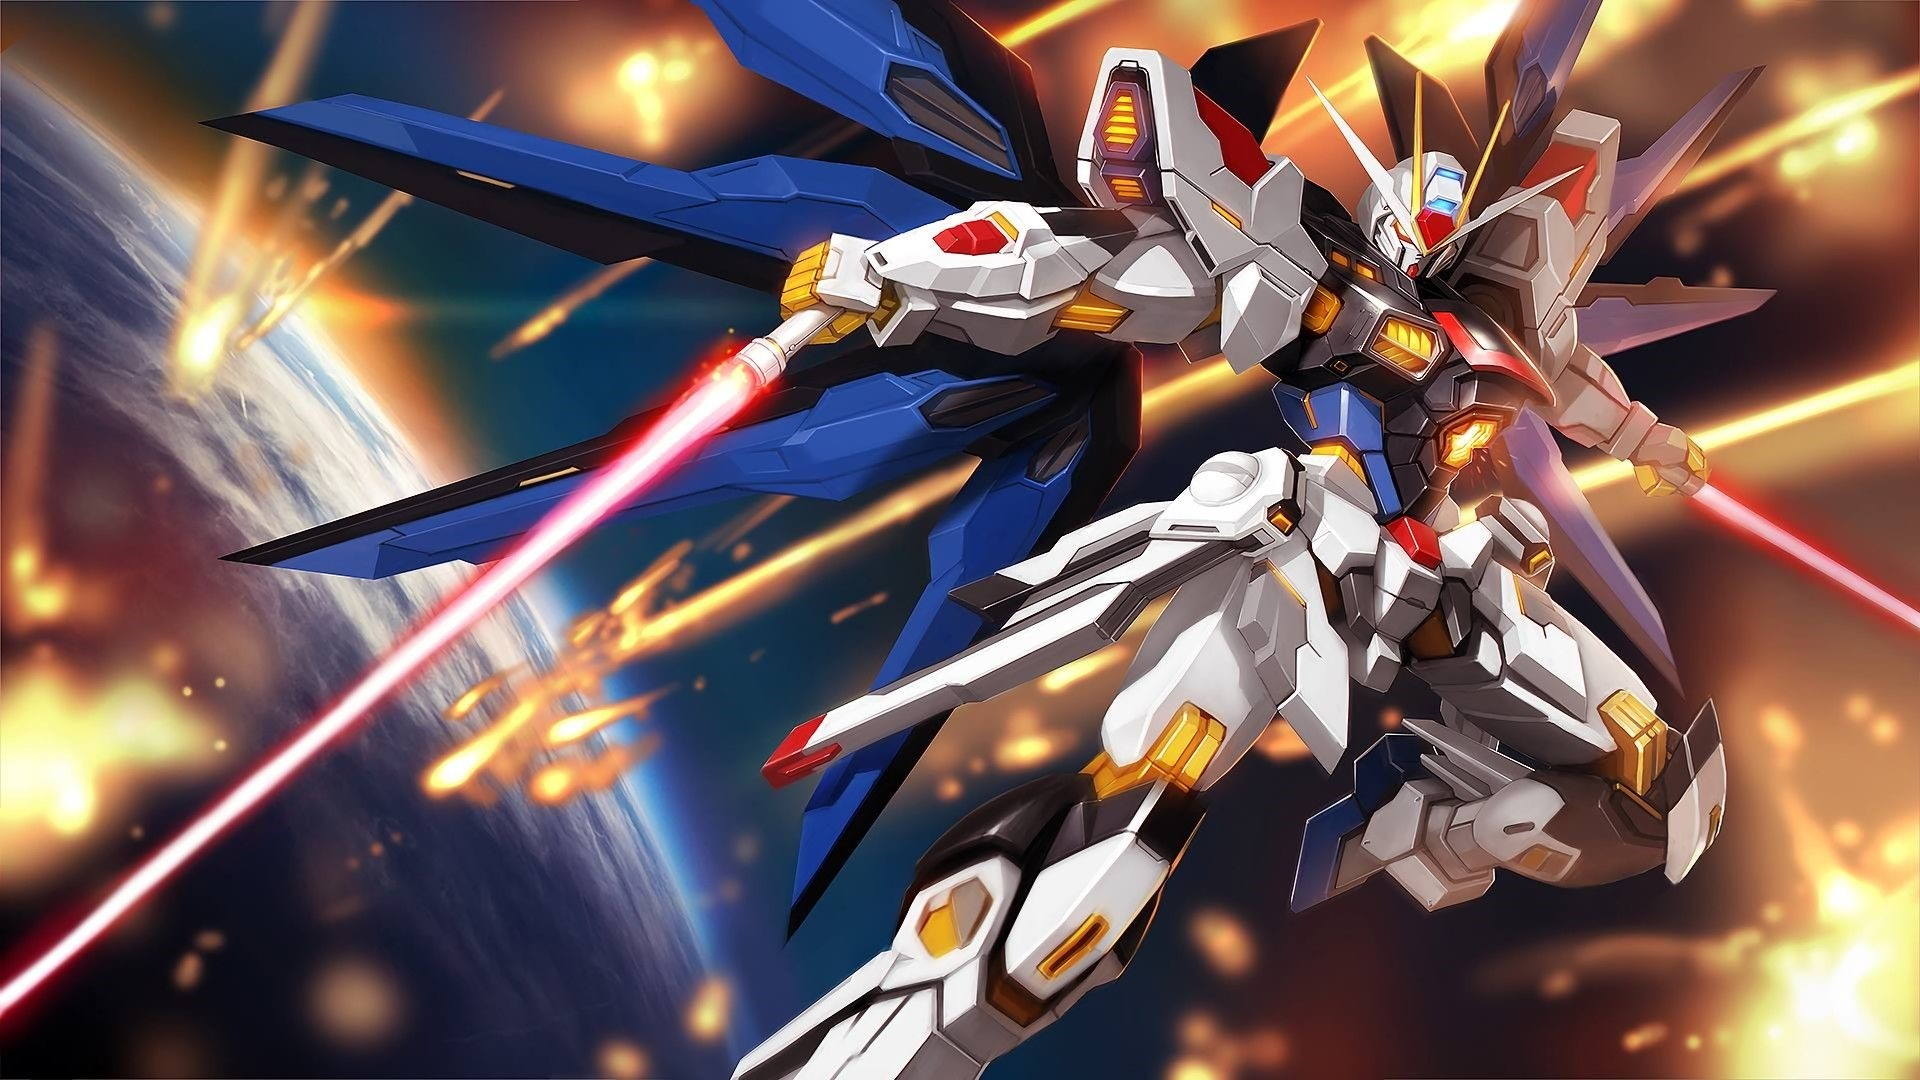 Gundam Wallpaper Free